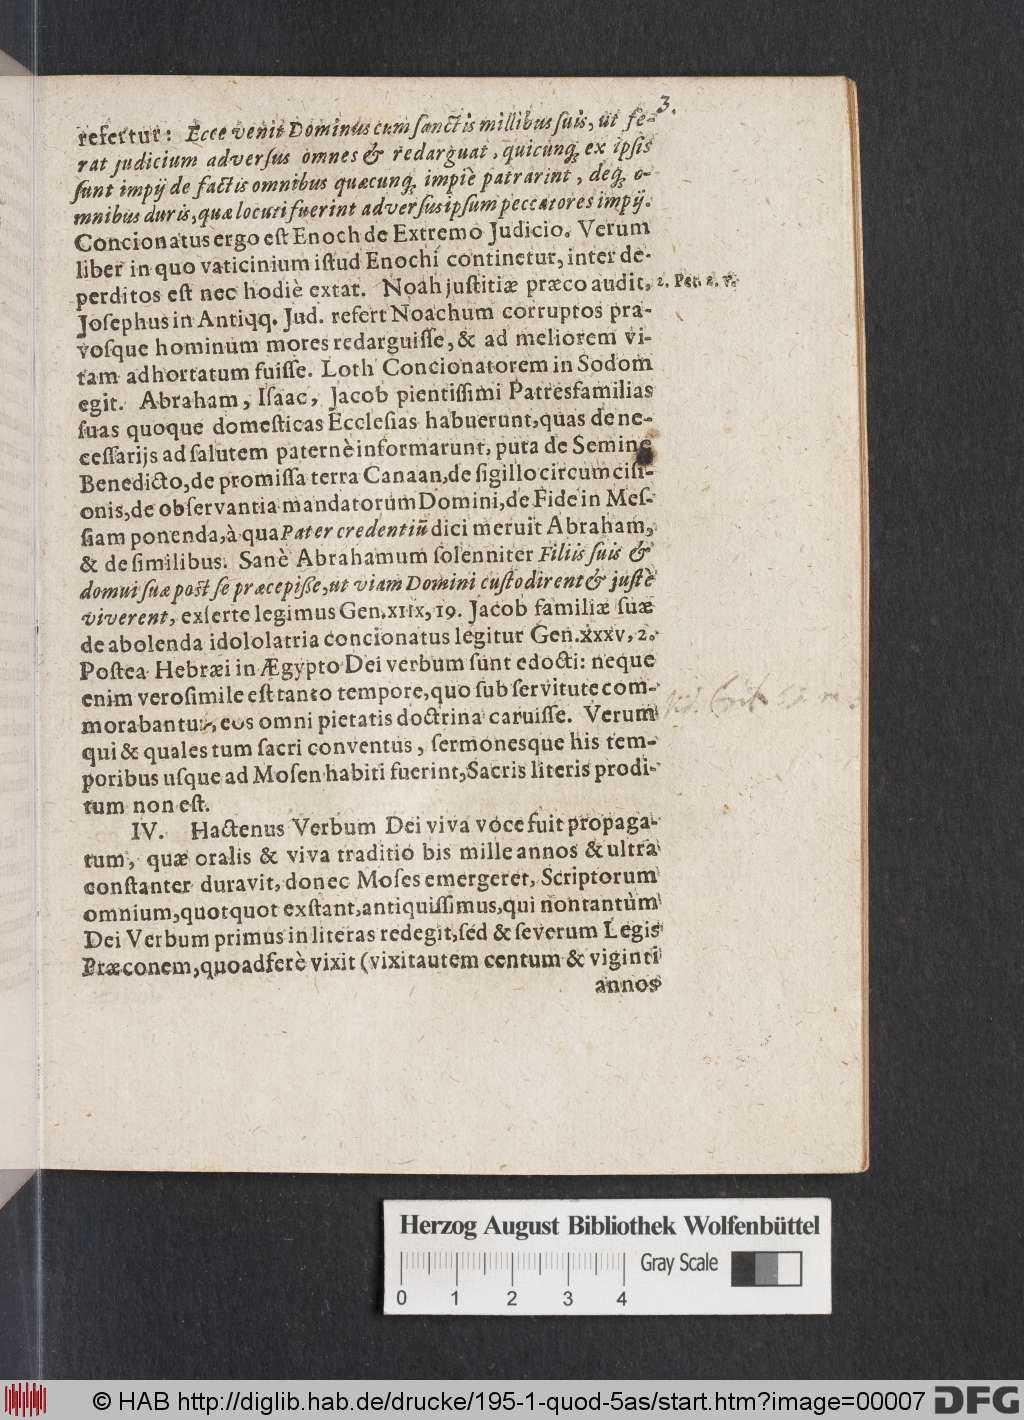 http://diglib.hab.de/drucke/195-1-quod-5as/00007.jpg